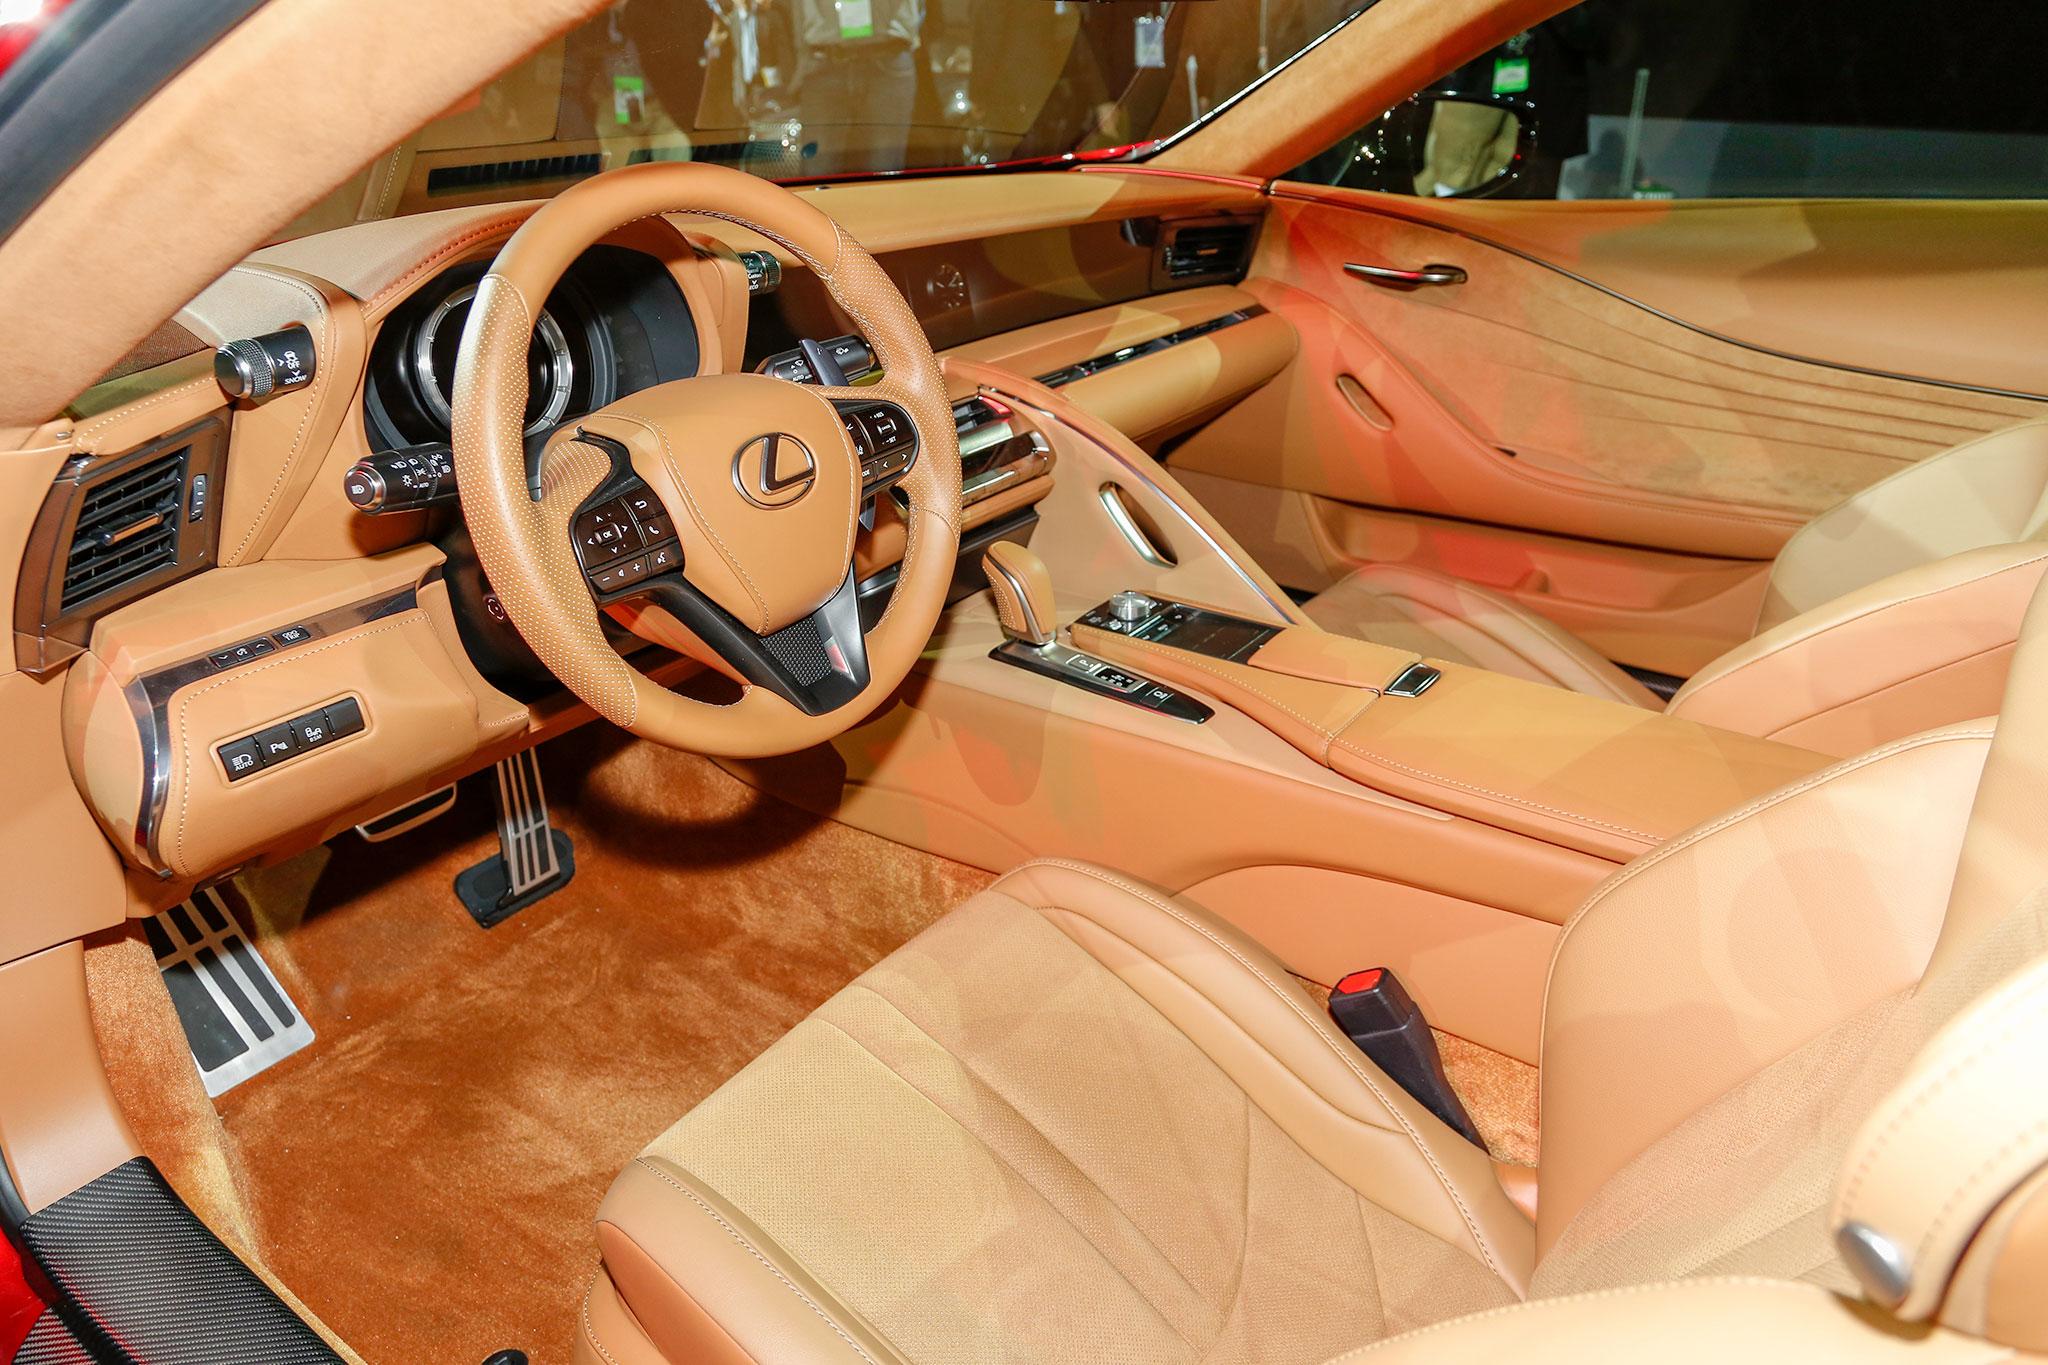 http://st.automobilemag.com/uploads/sites/11/2016/01/2018-Lexus-LC-500-cabin.jpg